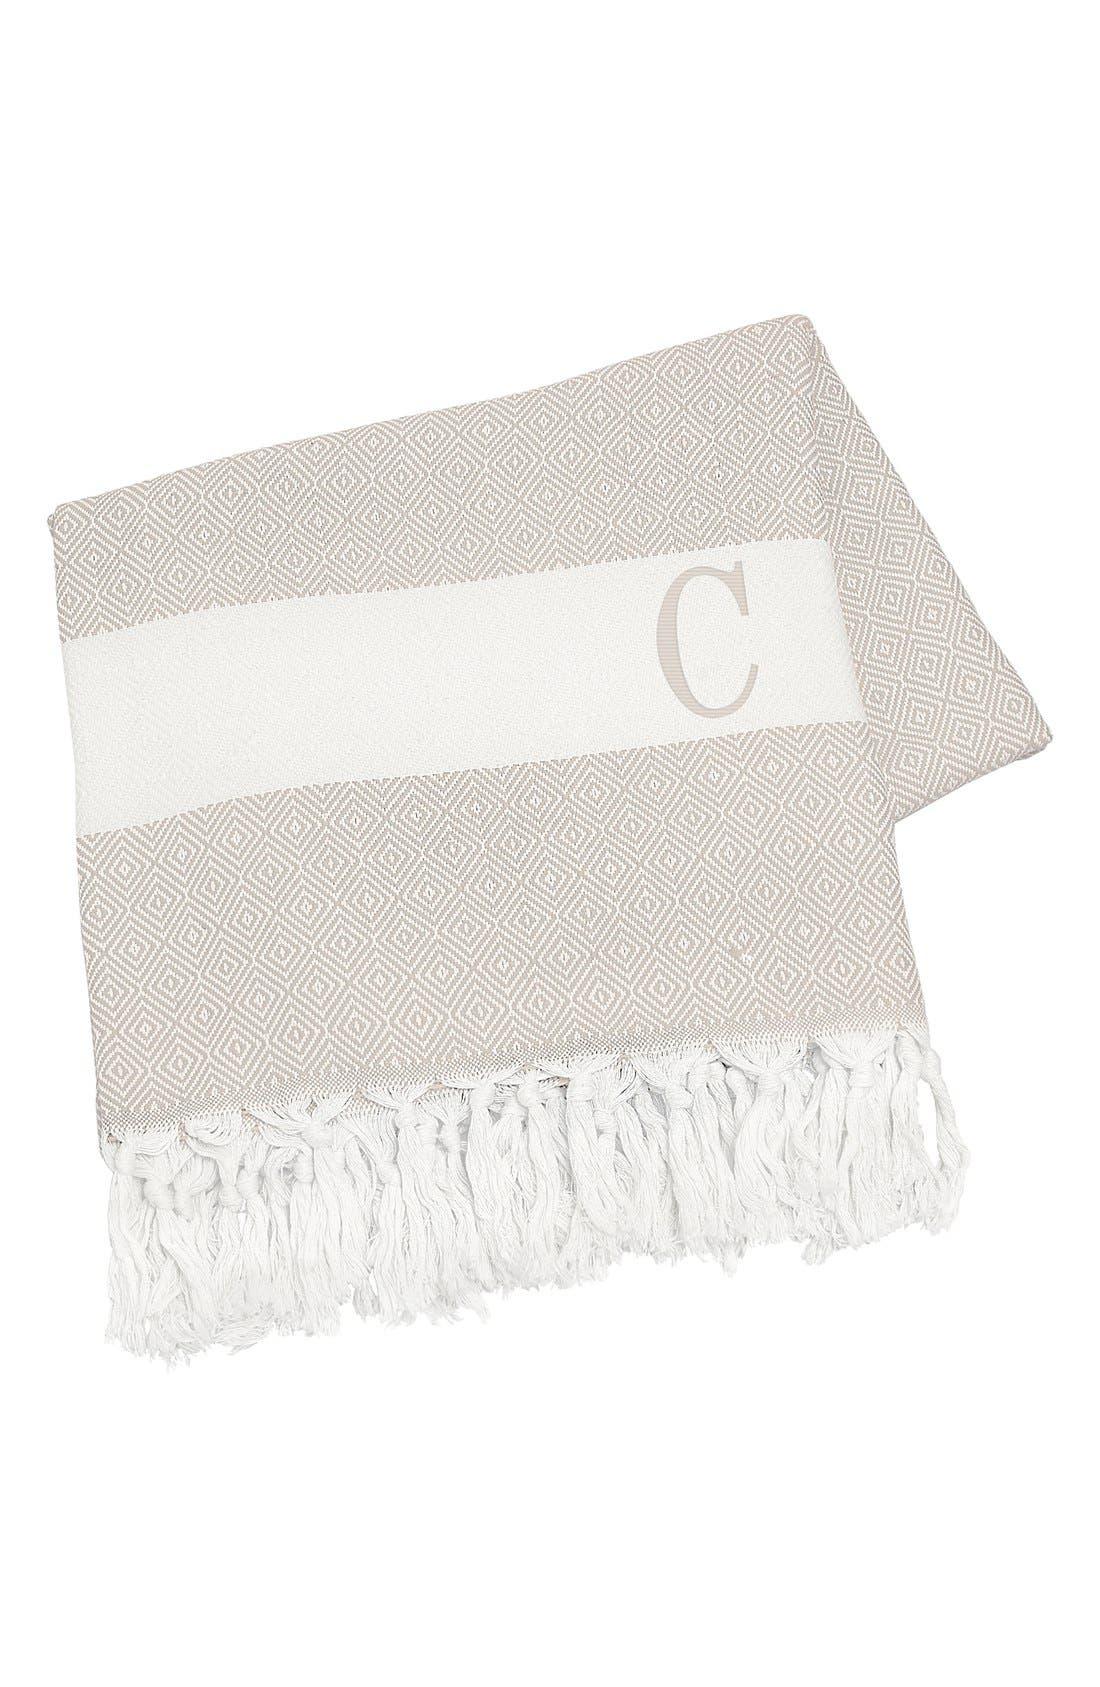 Monogram Turkish Cotton Throw,                             Main thumbnail 1, color,